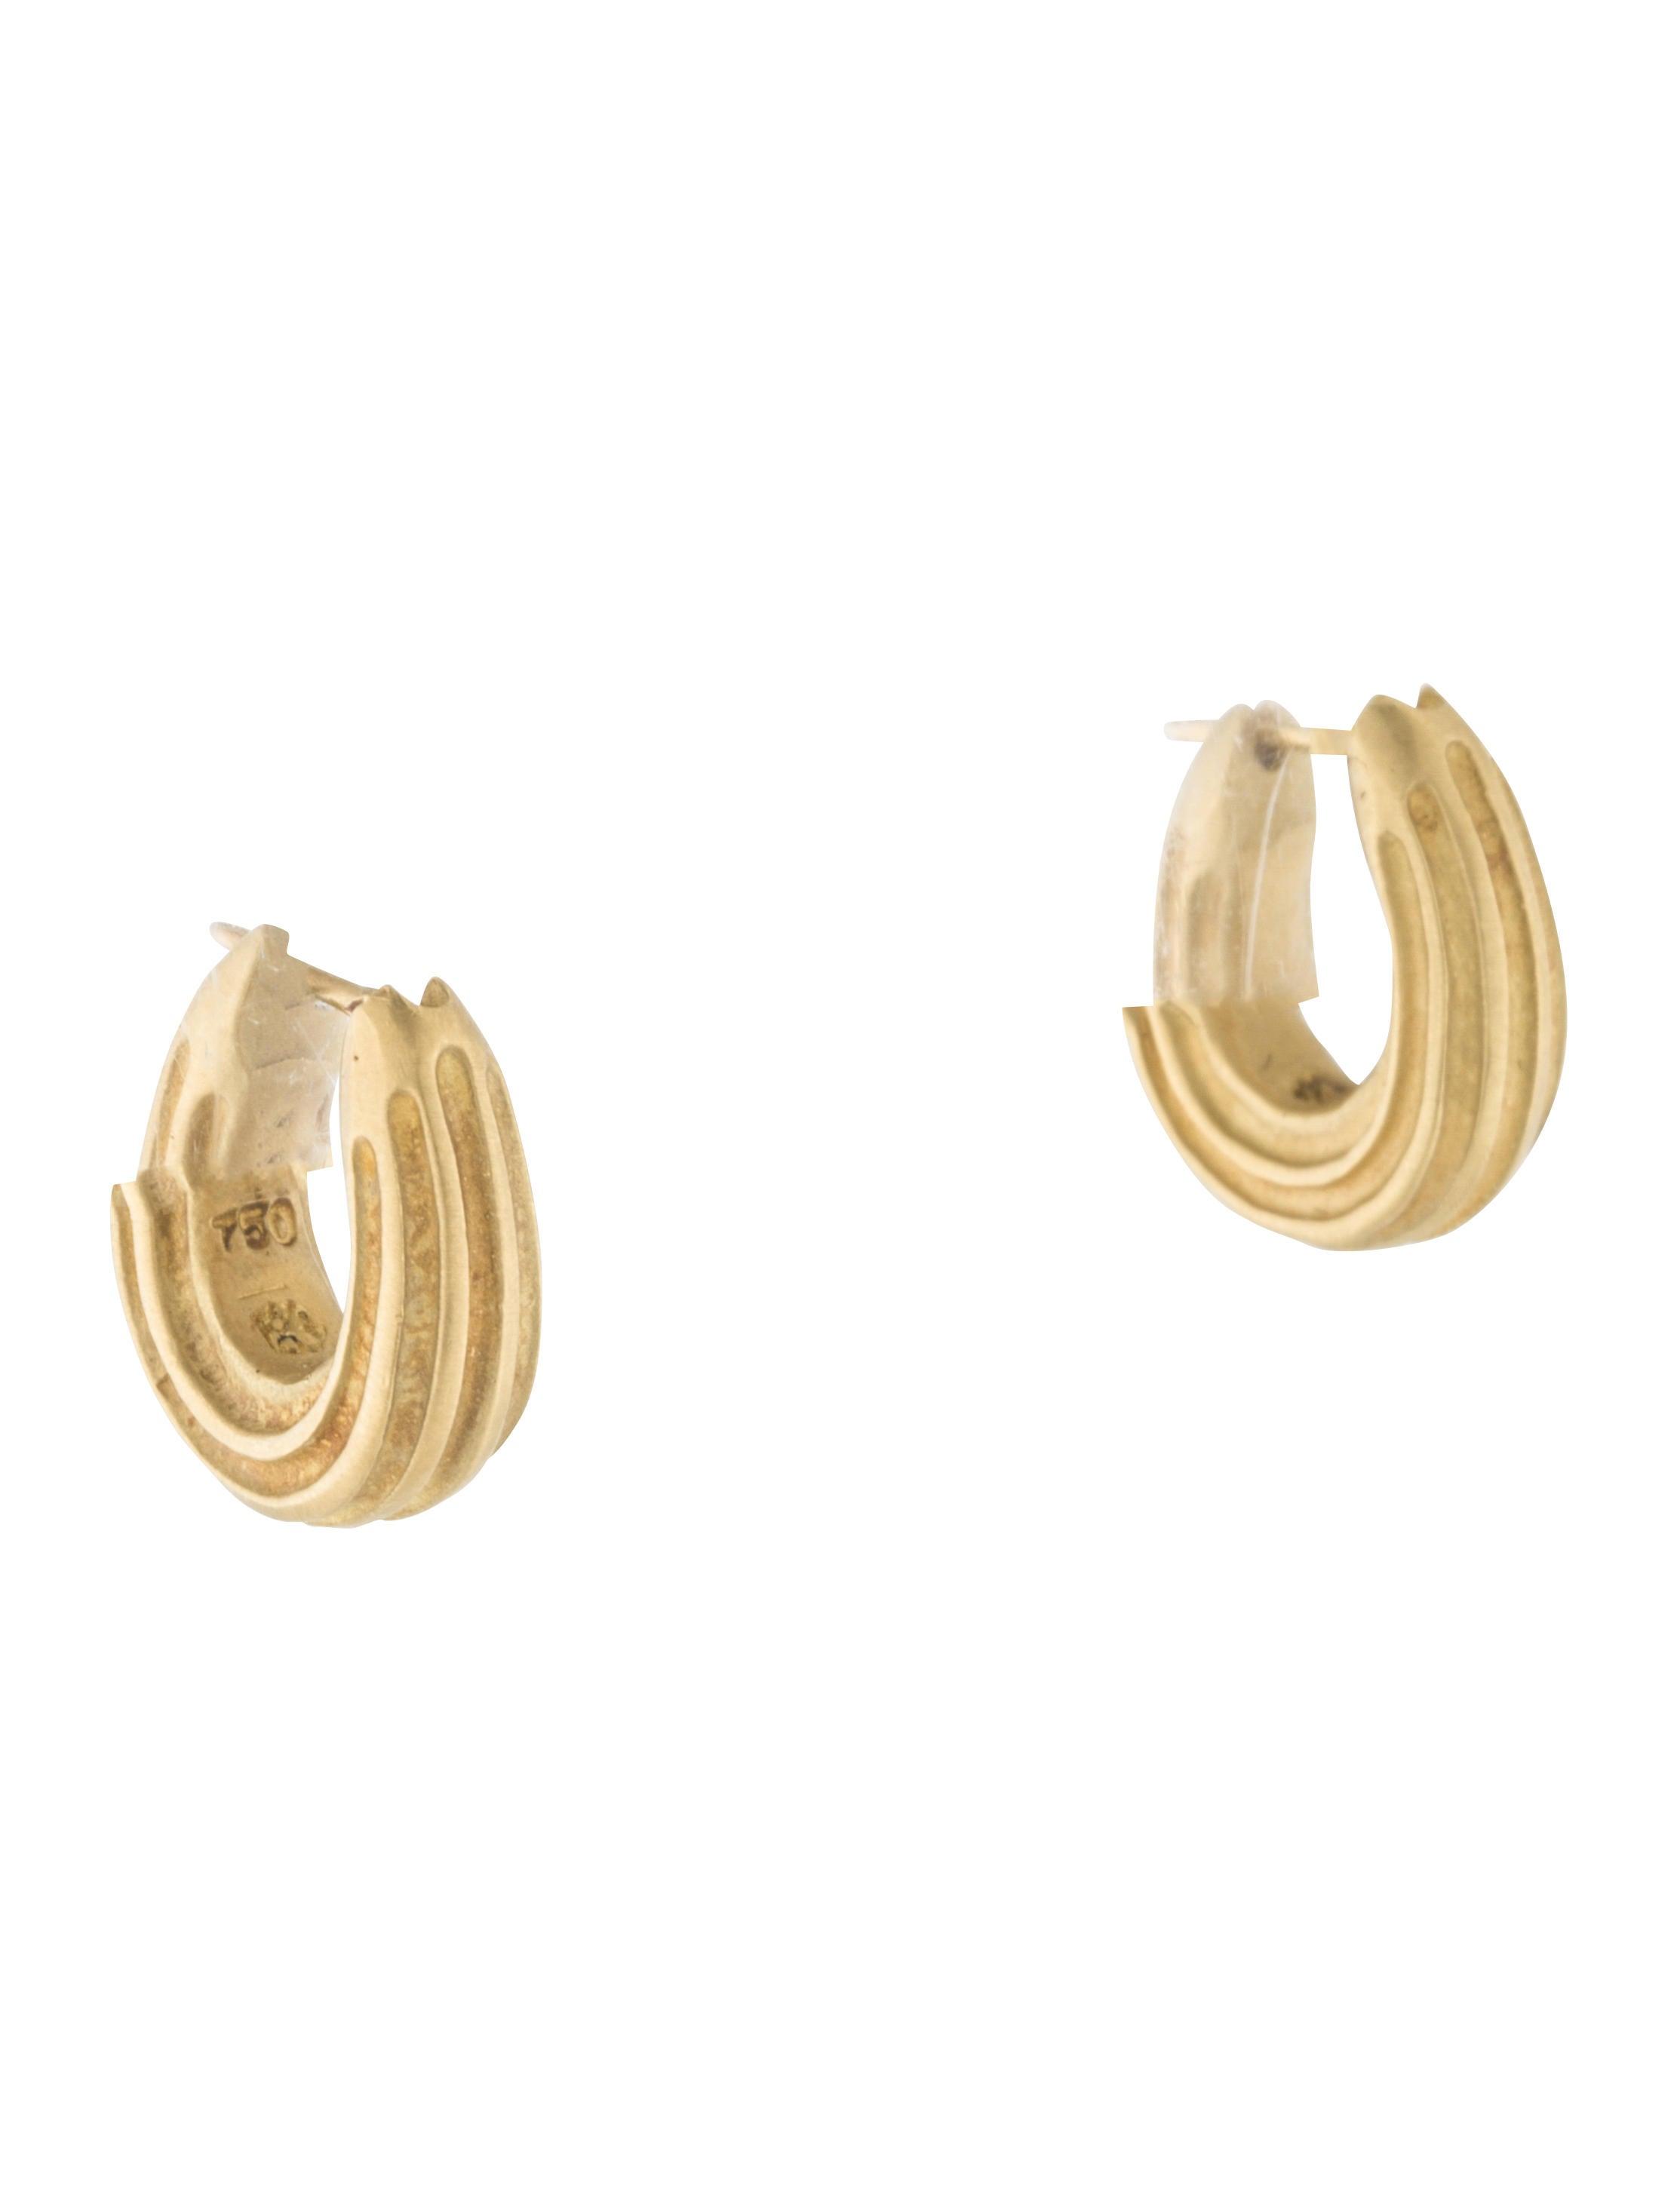 slane 18k huggie earrings earrings ws520442 the realreal